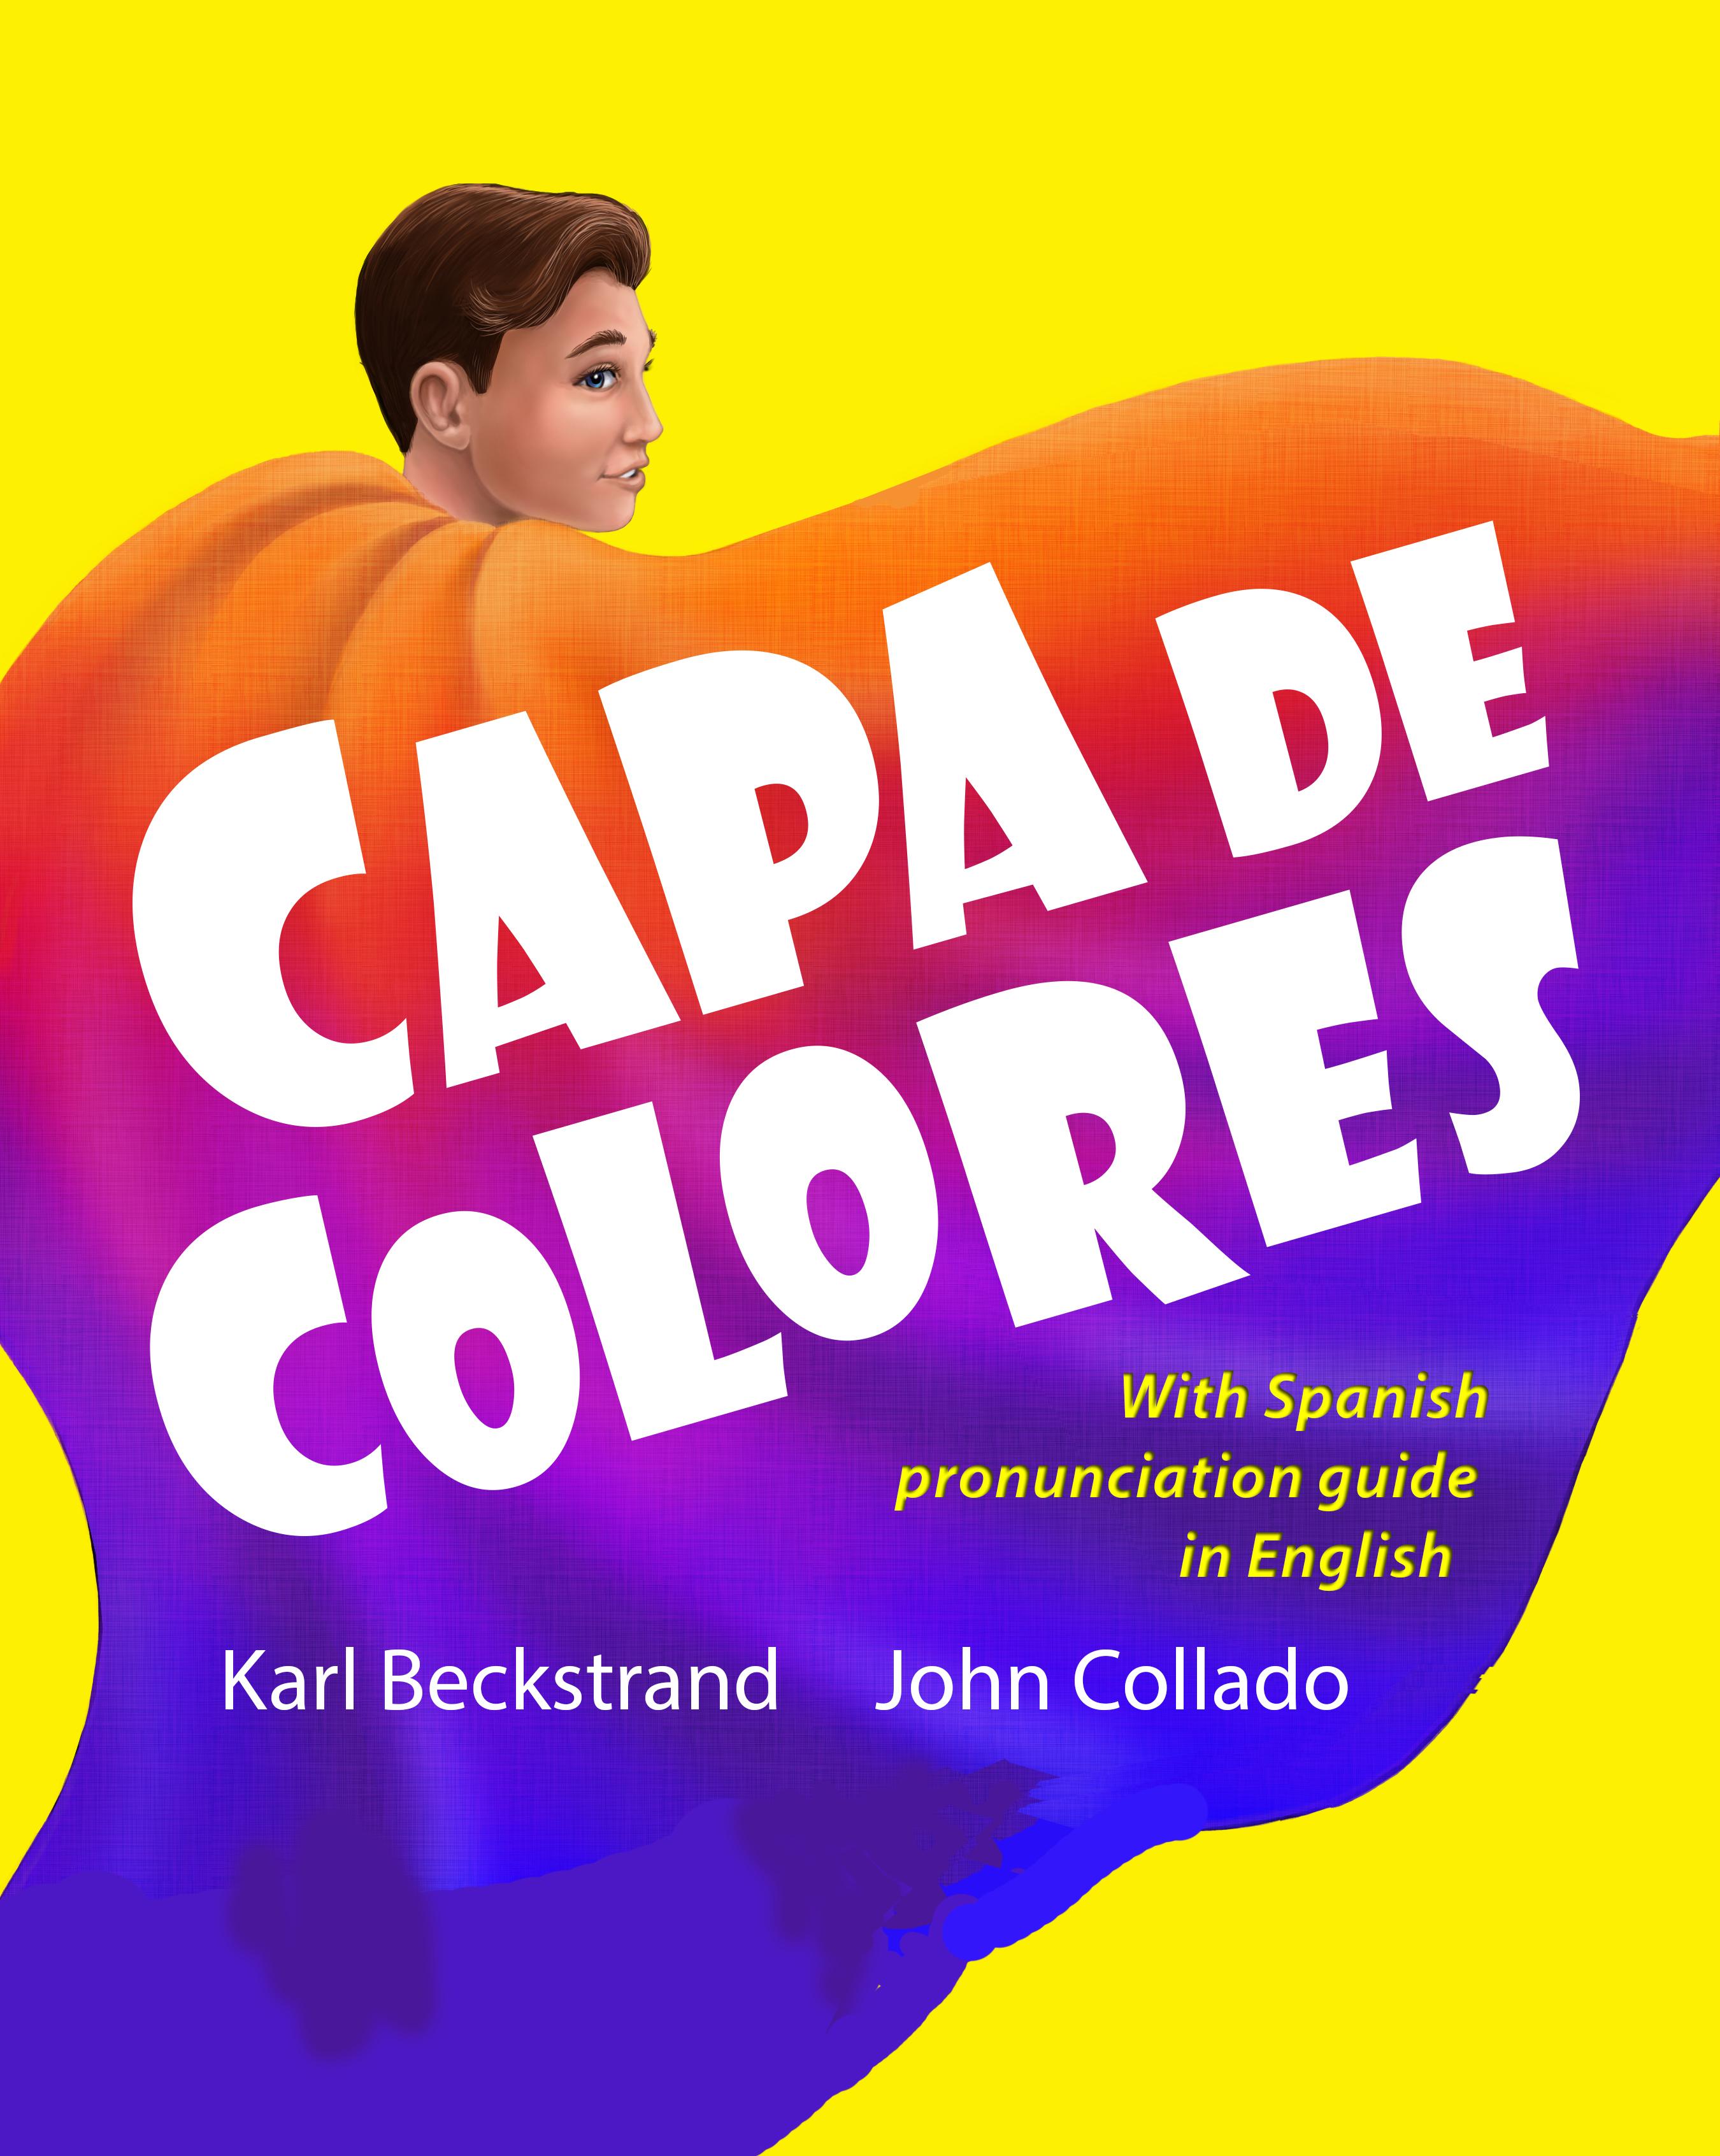 Capa de colores: Spanish with English Pronunciation Guide